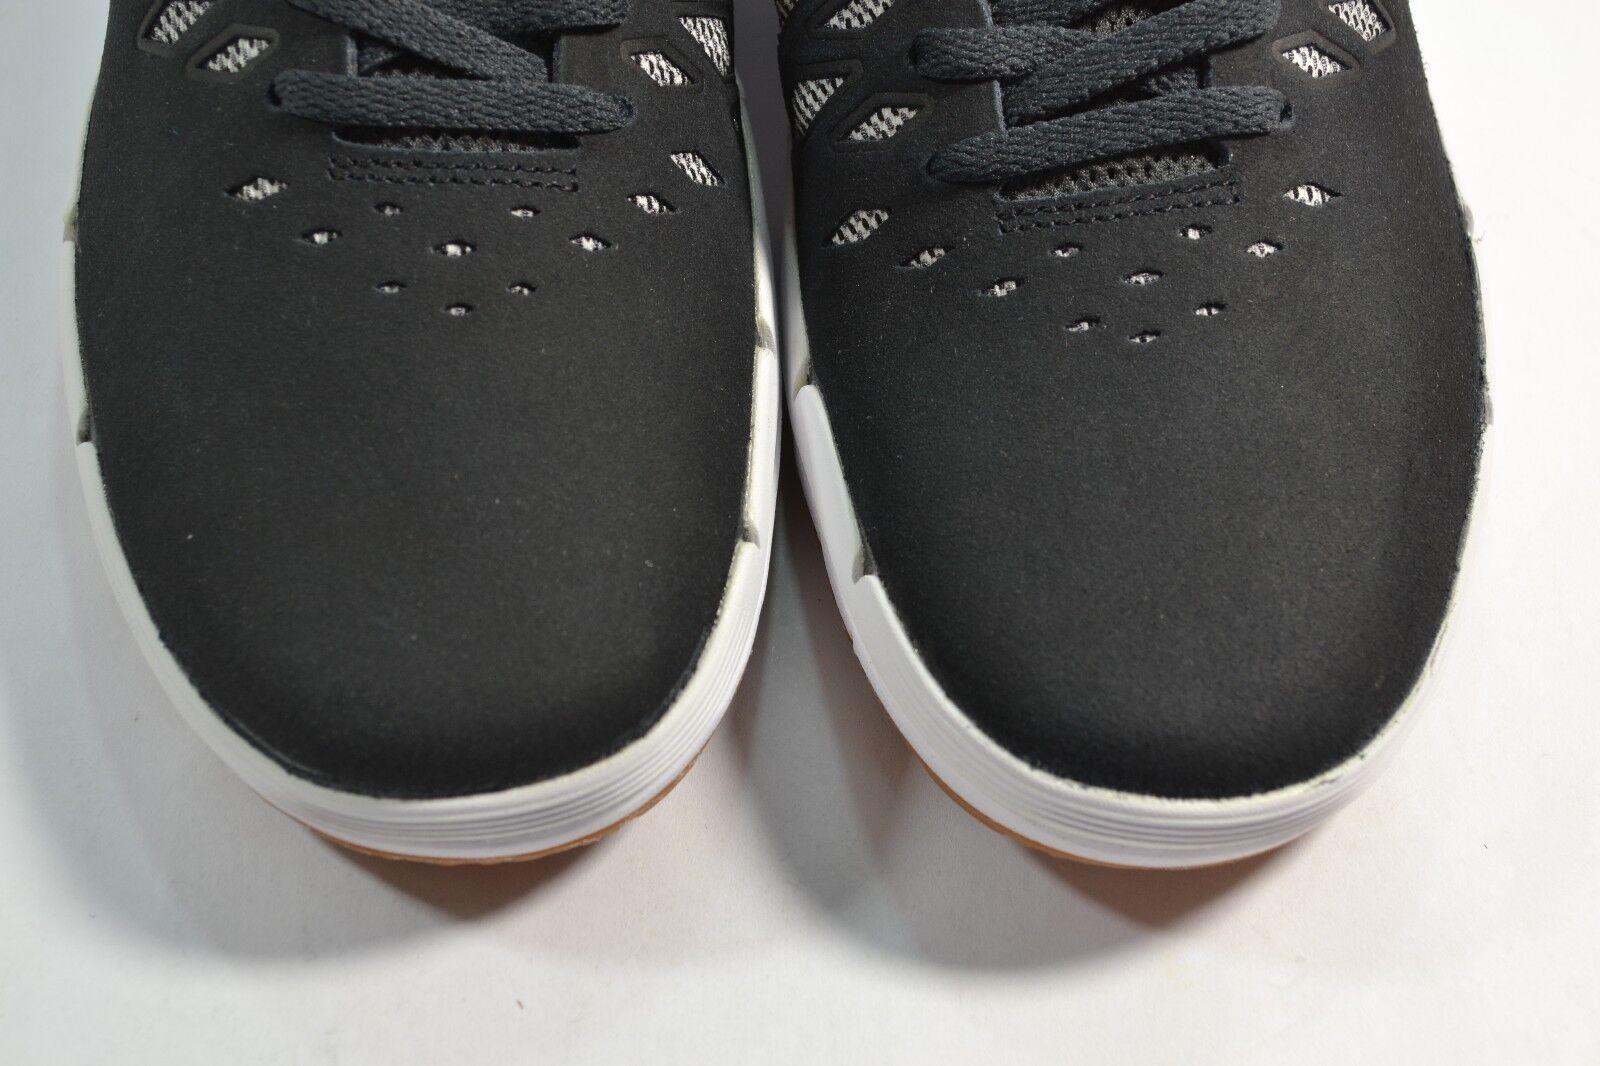 nike weiß nike free sb schwarz dunkle grau - weiß nike skate